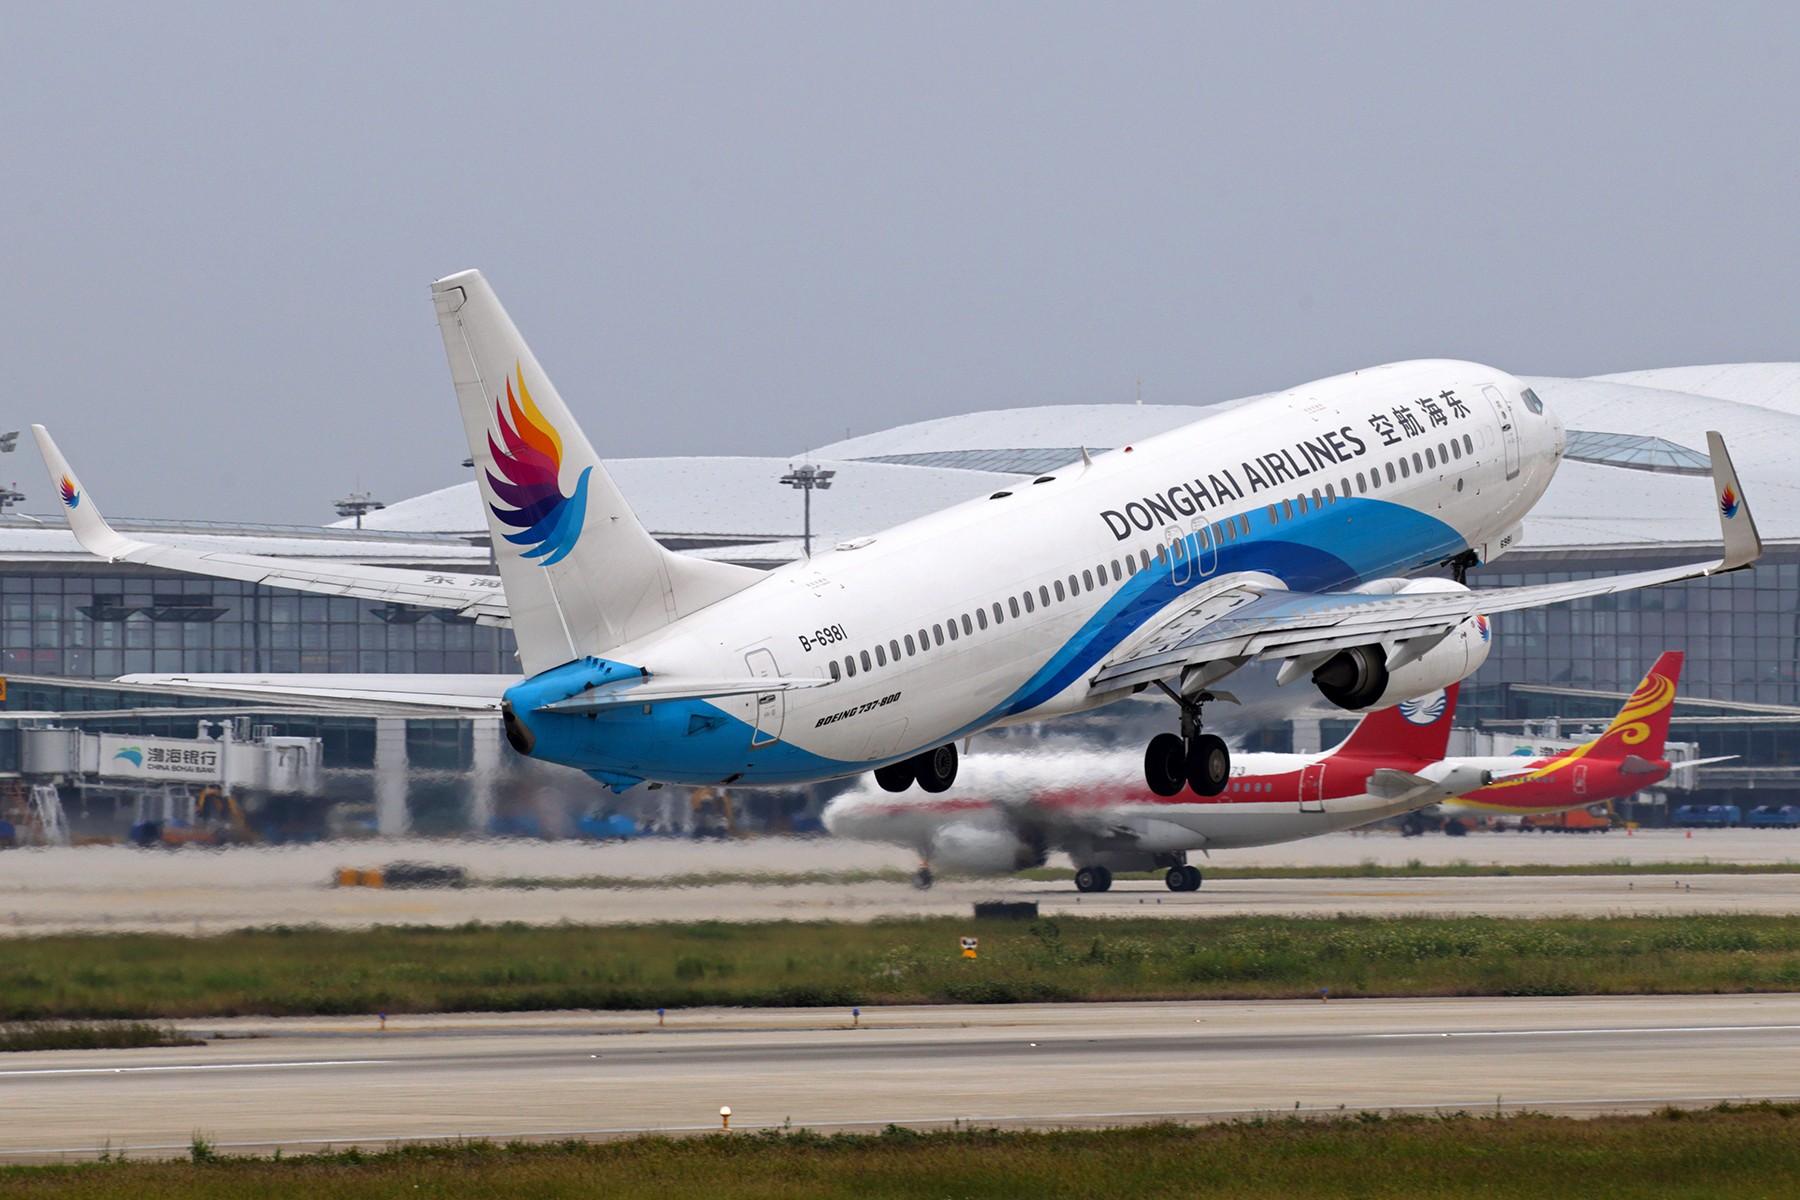 Re:[原创]【BLDDQ】******NKG07/25单跑道运行中****** BOEING 737-800 B-6981 中国南京禄口国际机场